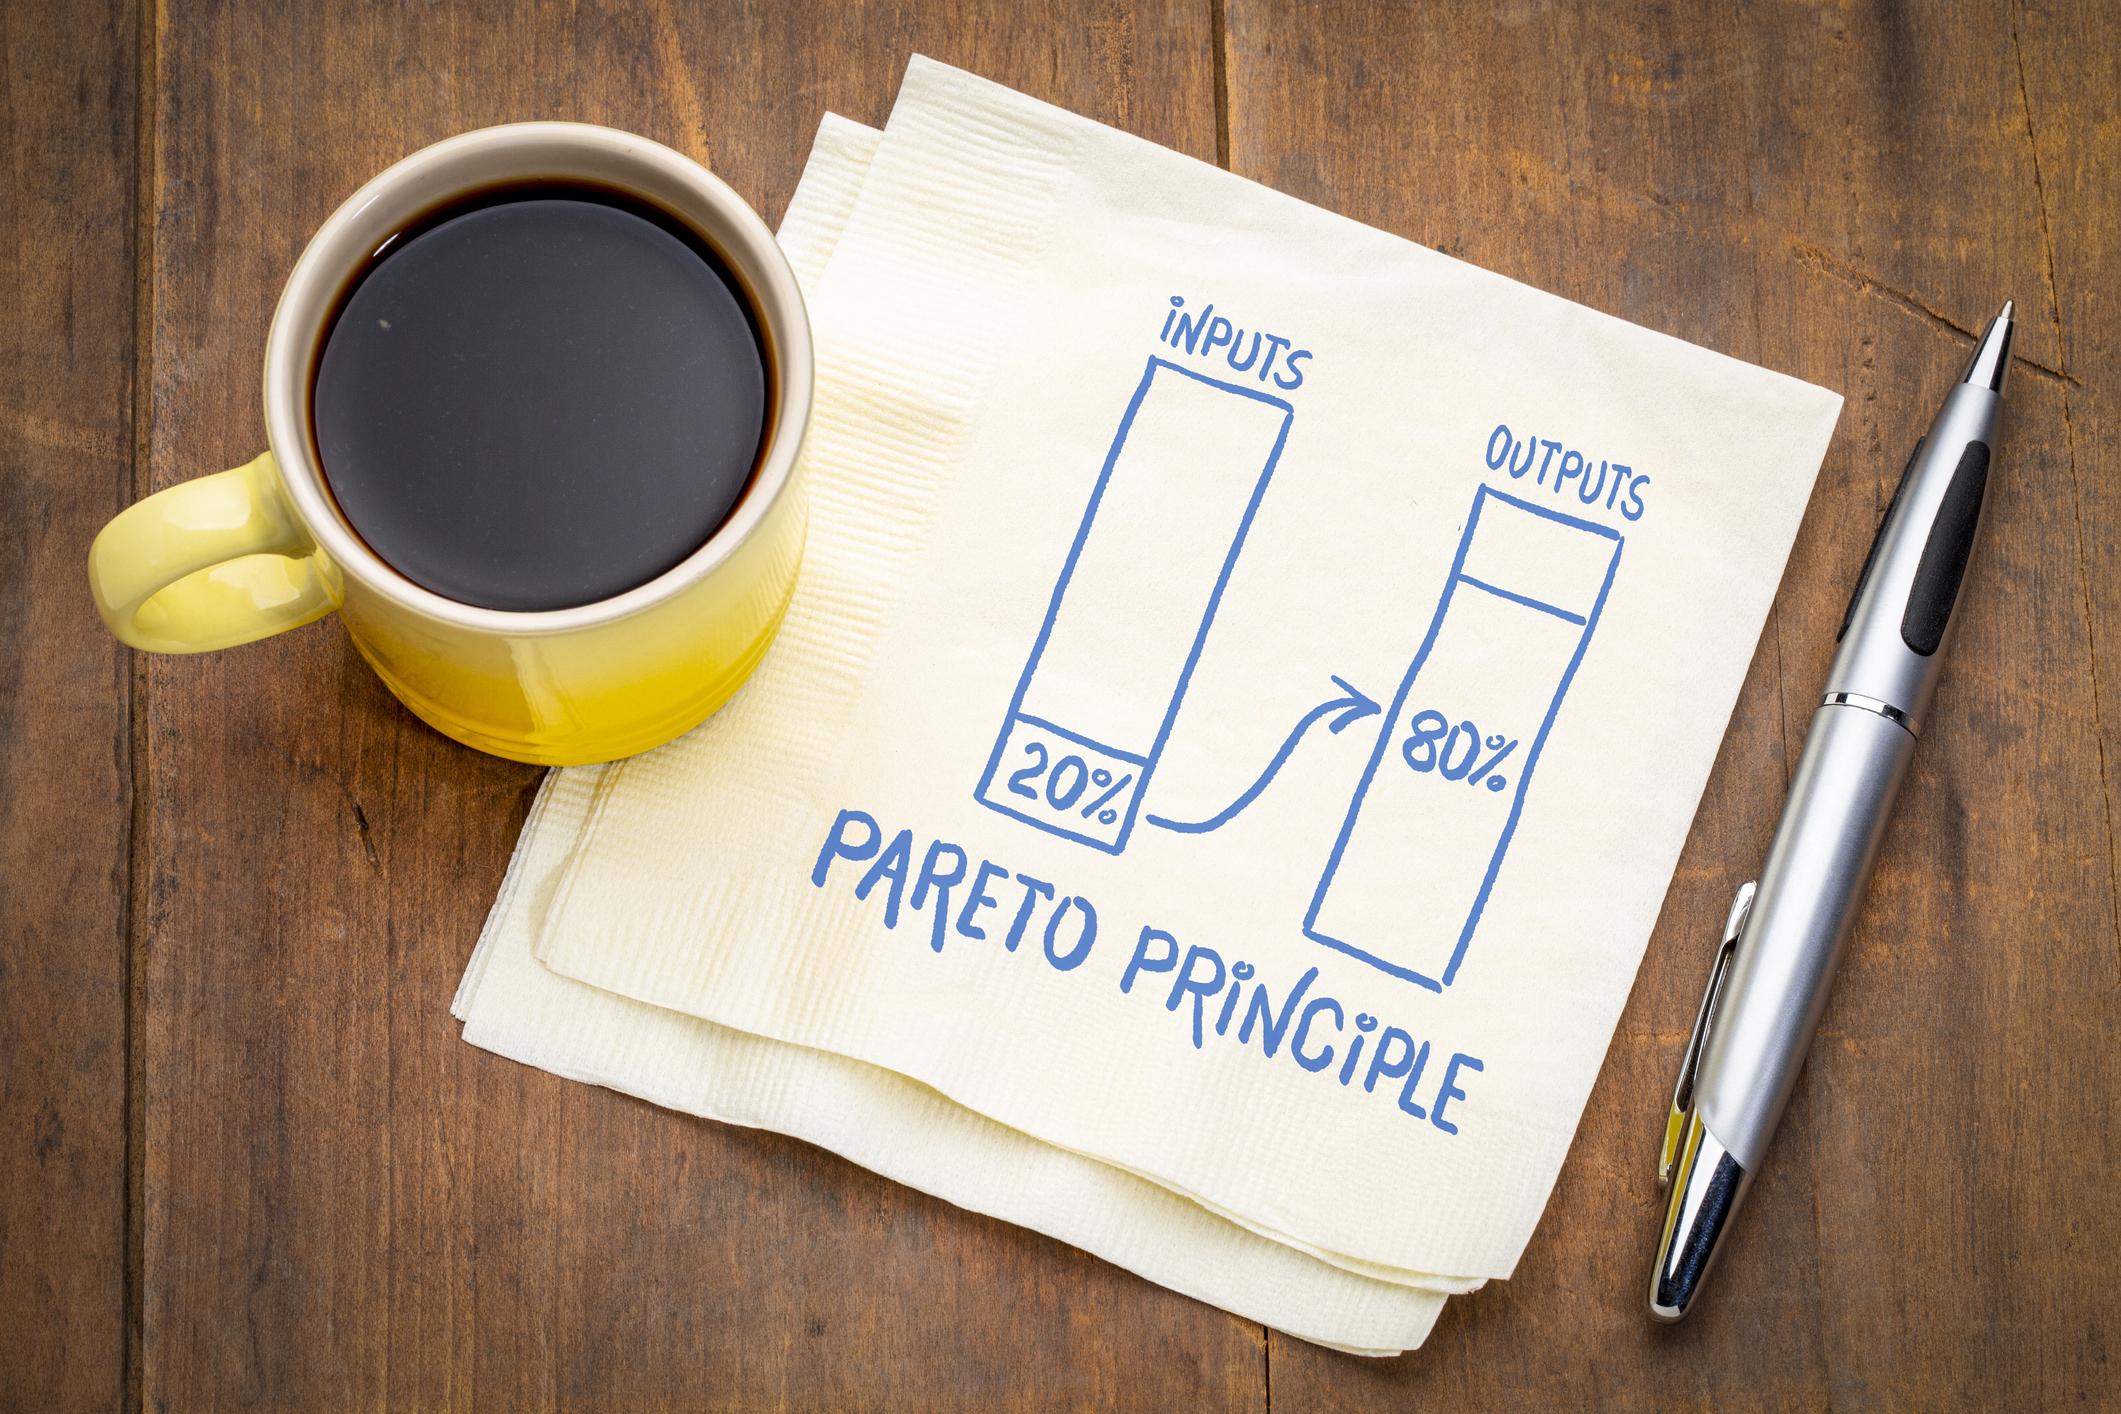 The pareto principle illustrated on a napkin